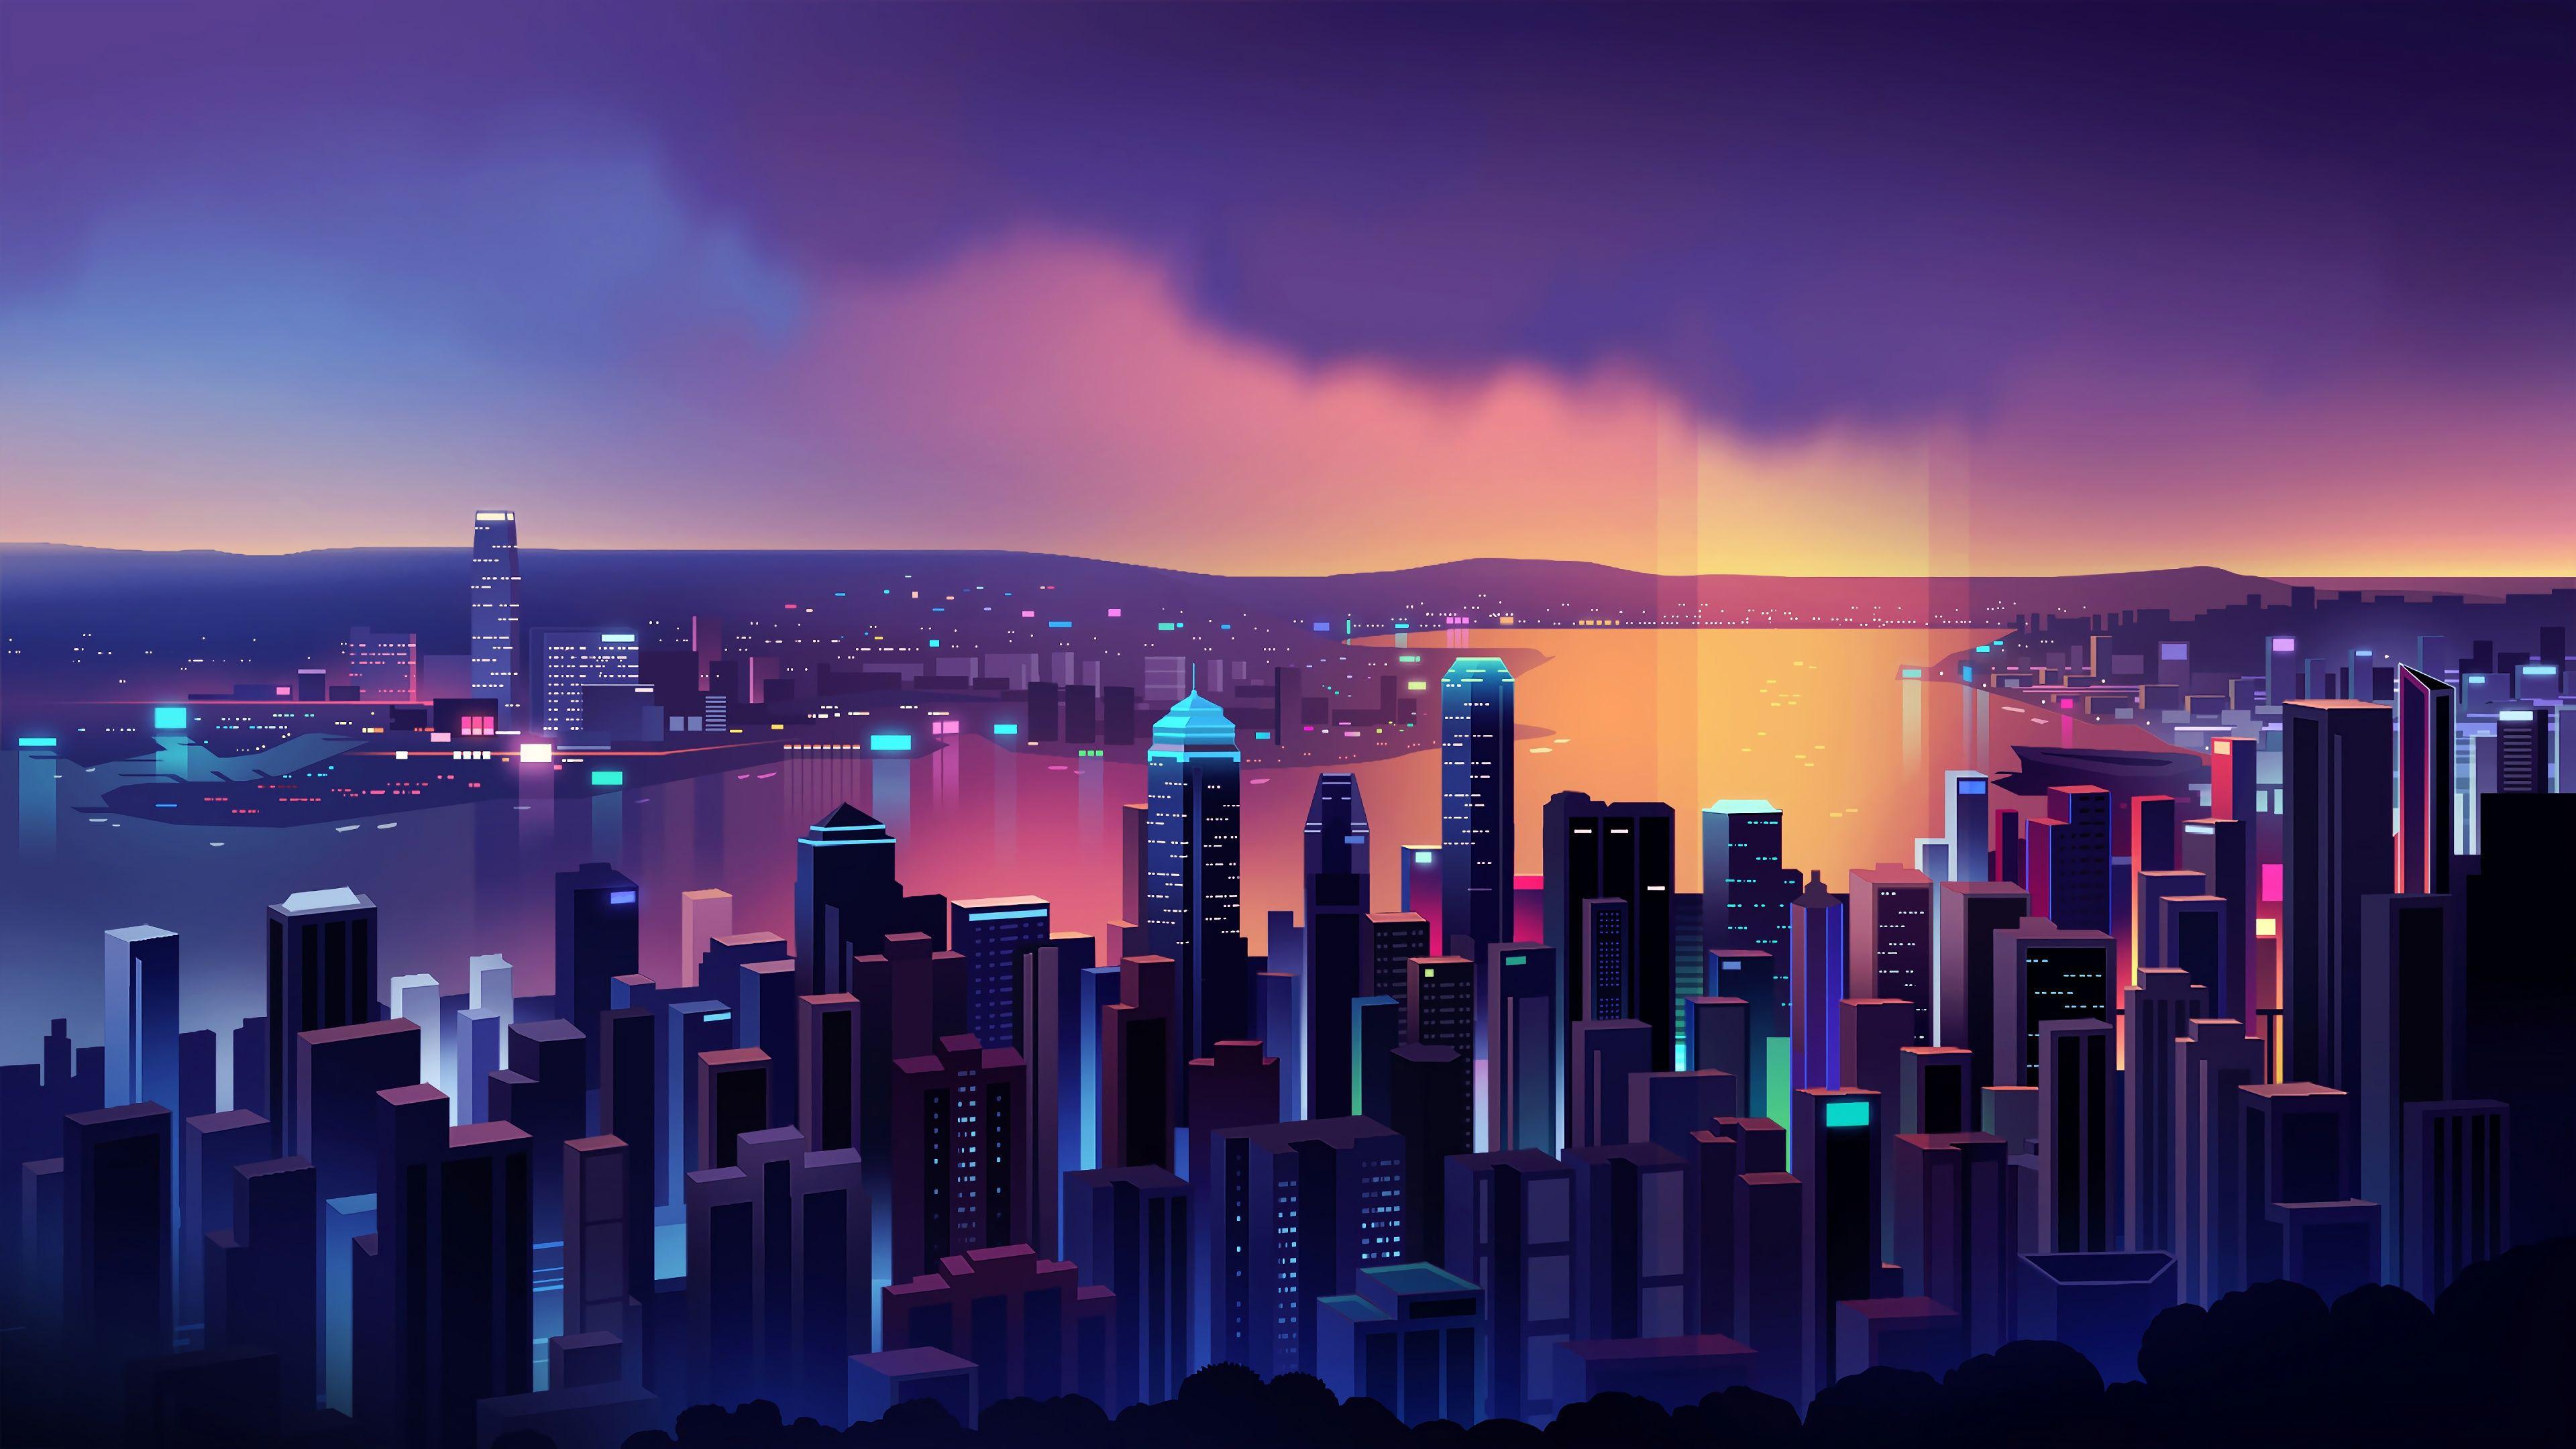 Neon City In 2020 City Wallpaper Cityscape Skyline